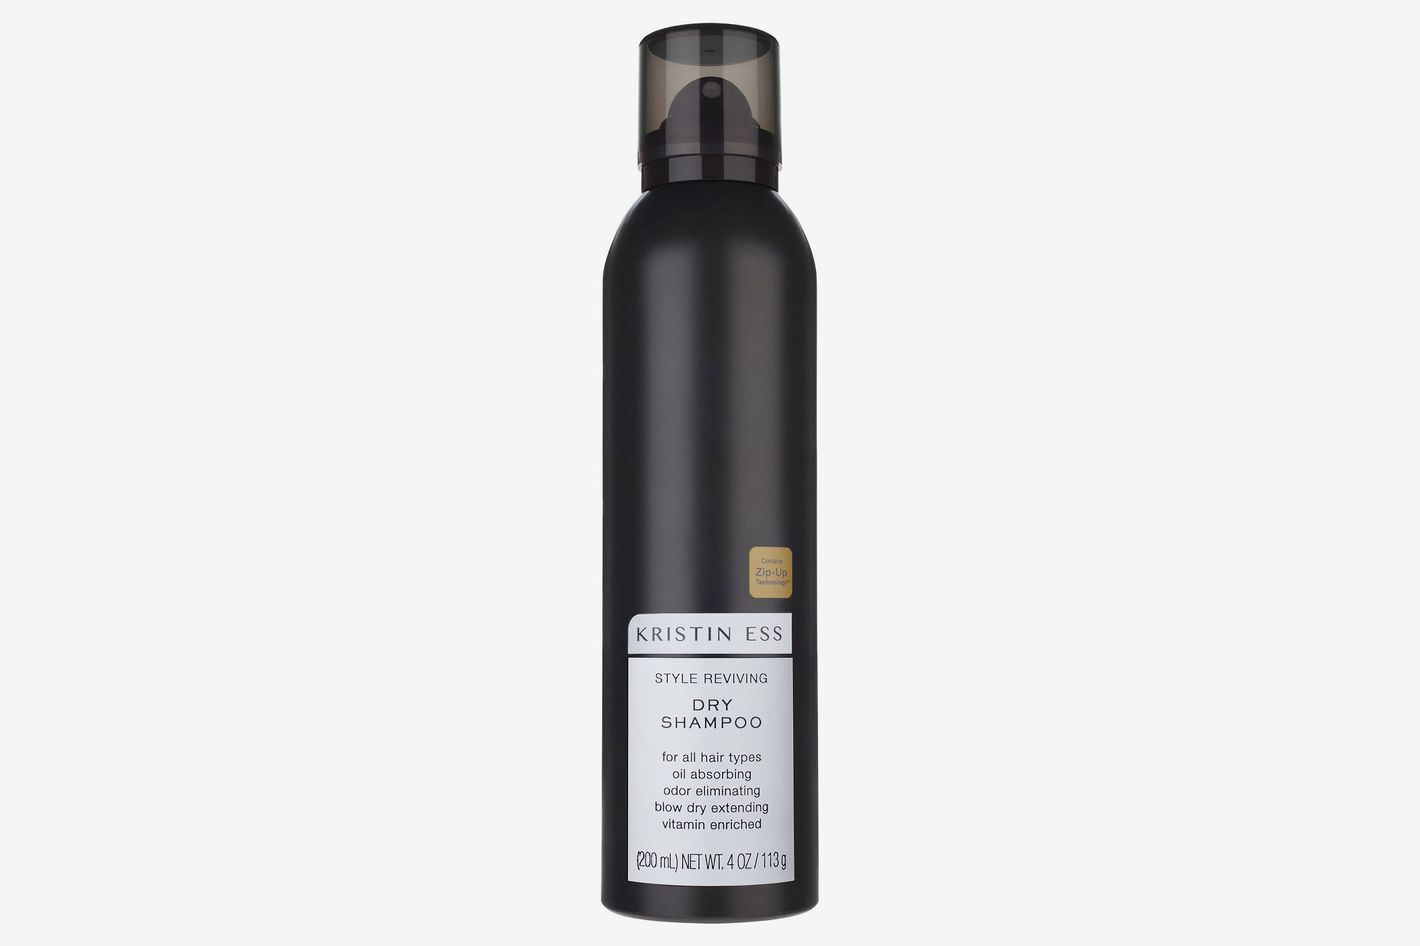 Kristin Ess Dry Shampoo